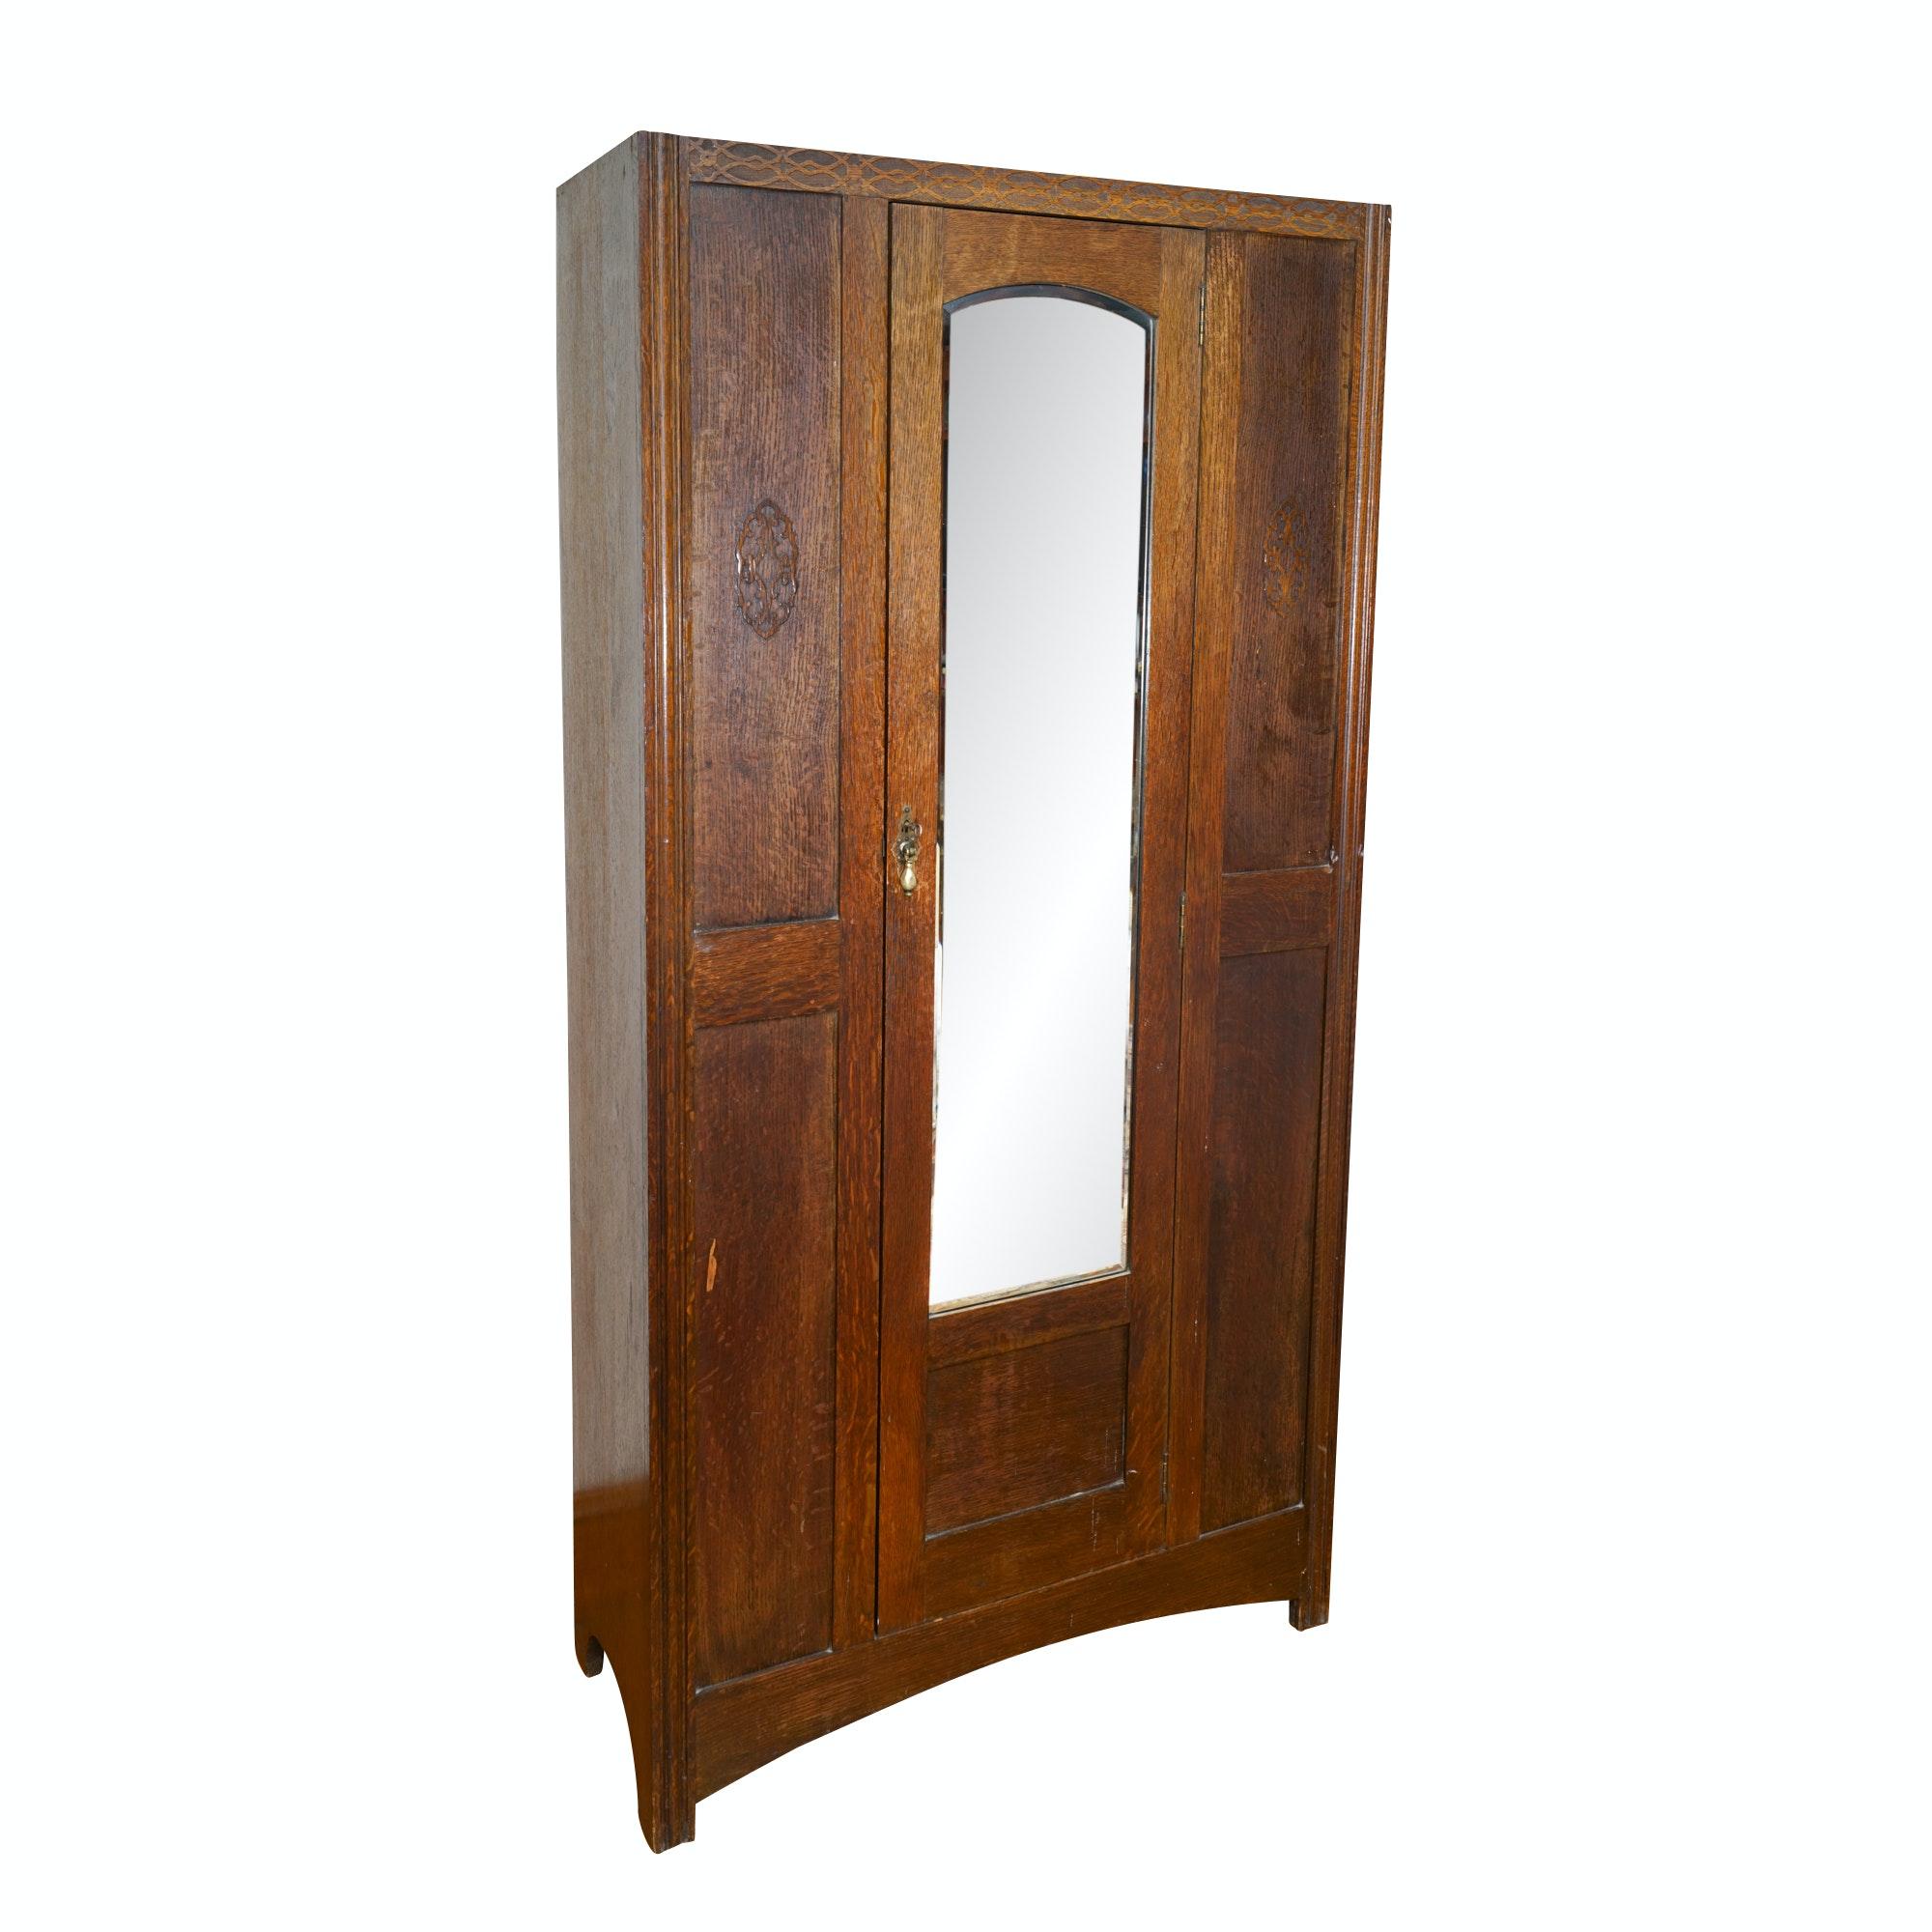 Vintage Oak Mirrored Armoire